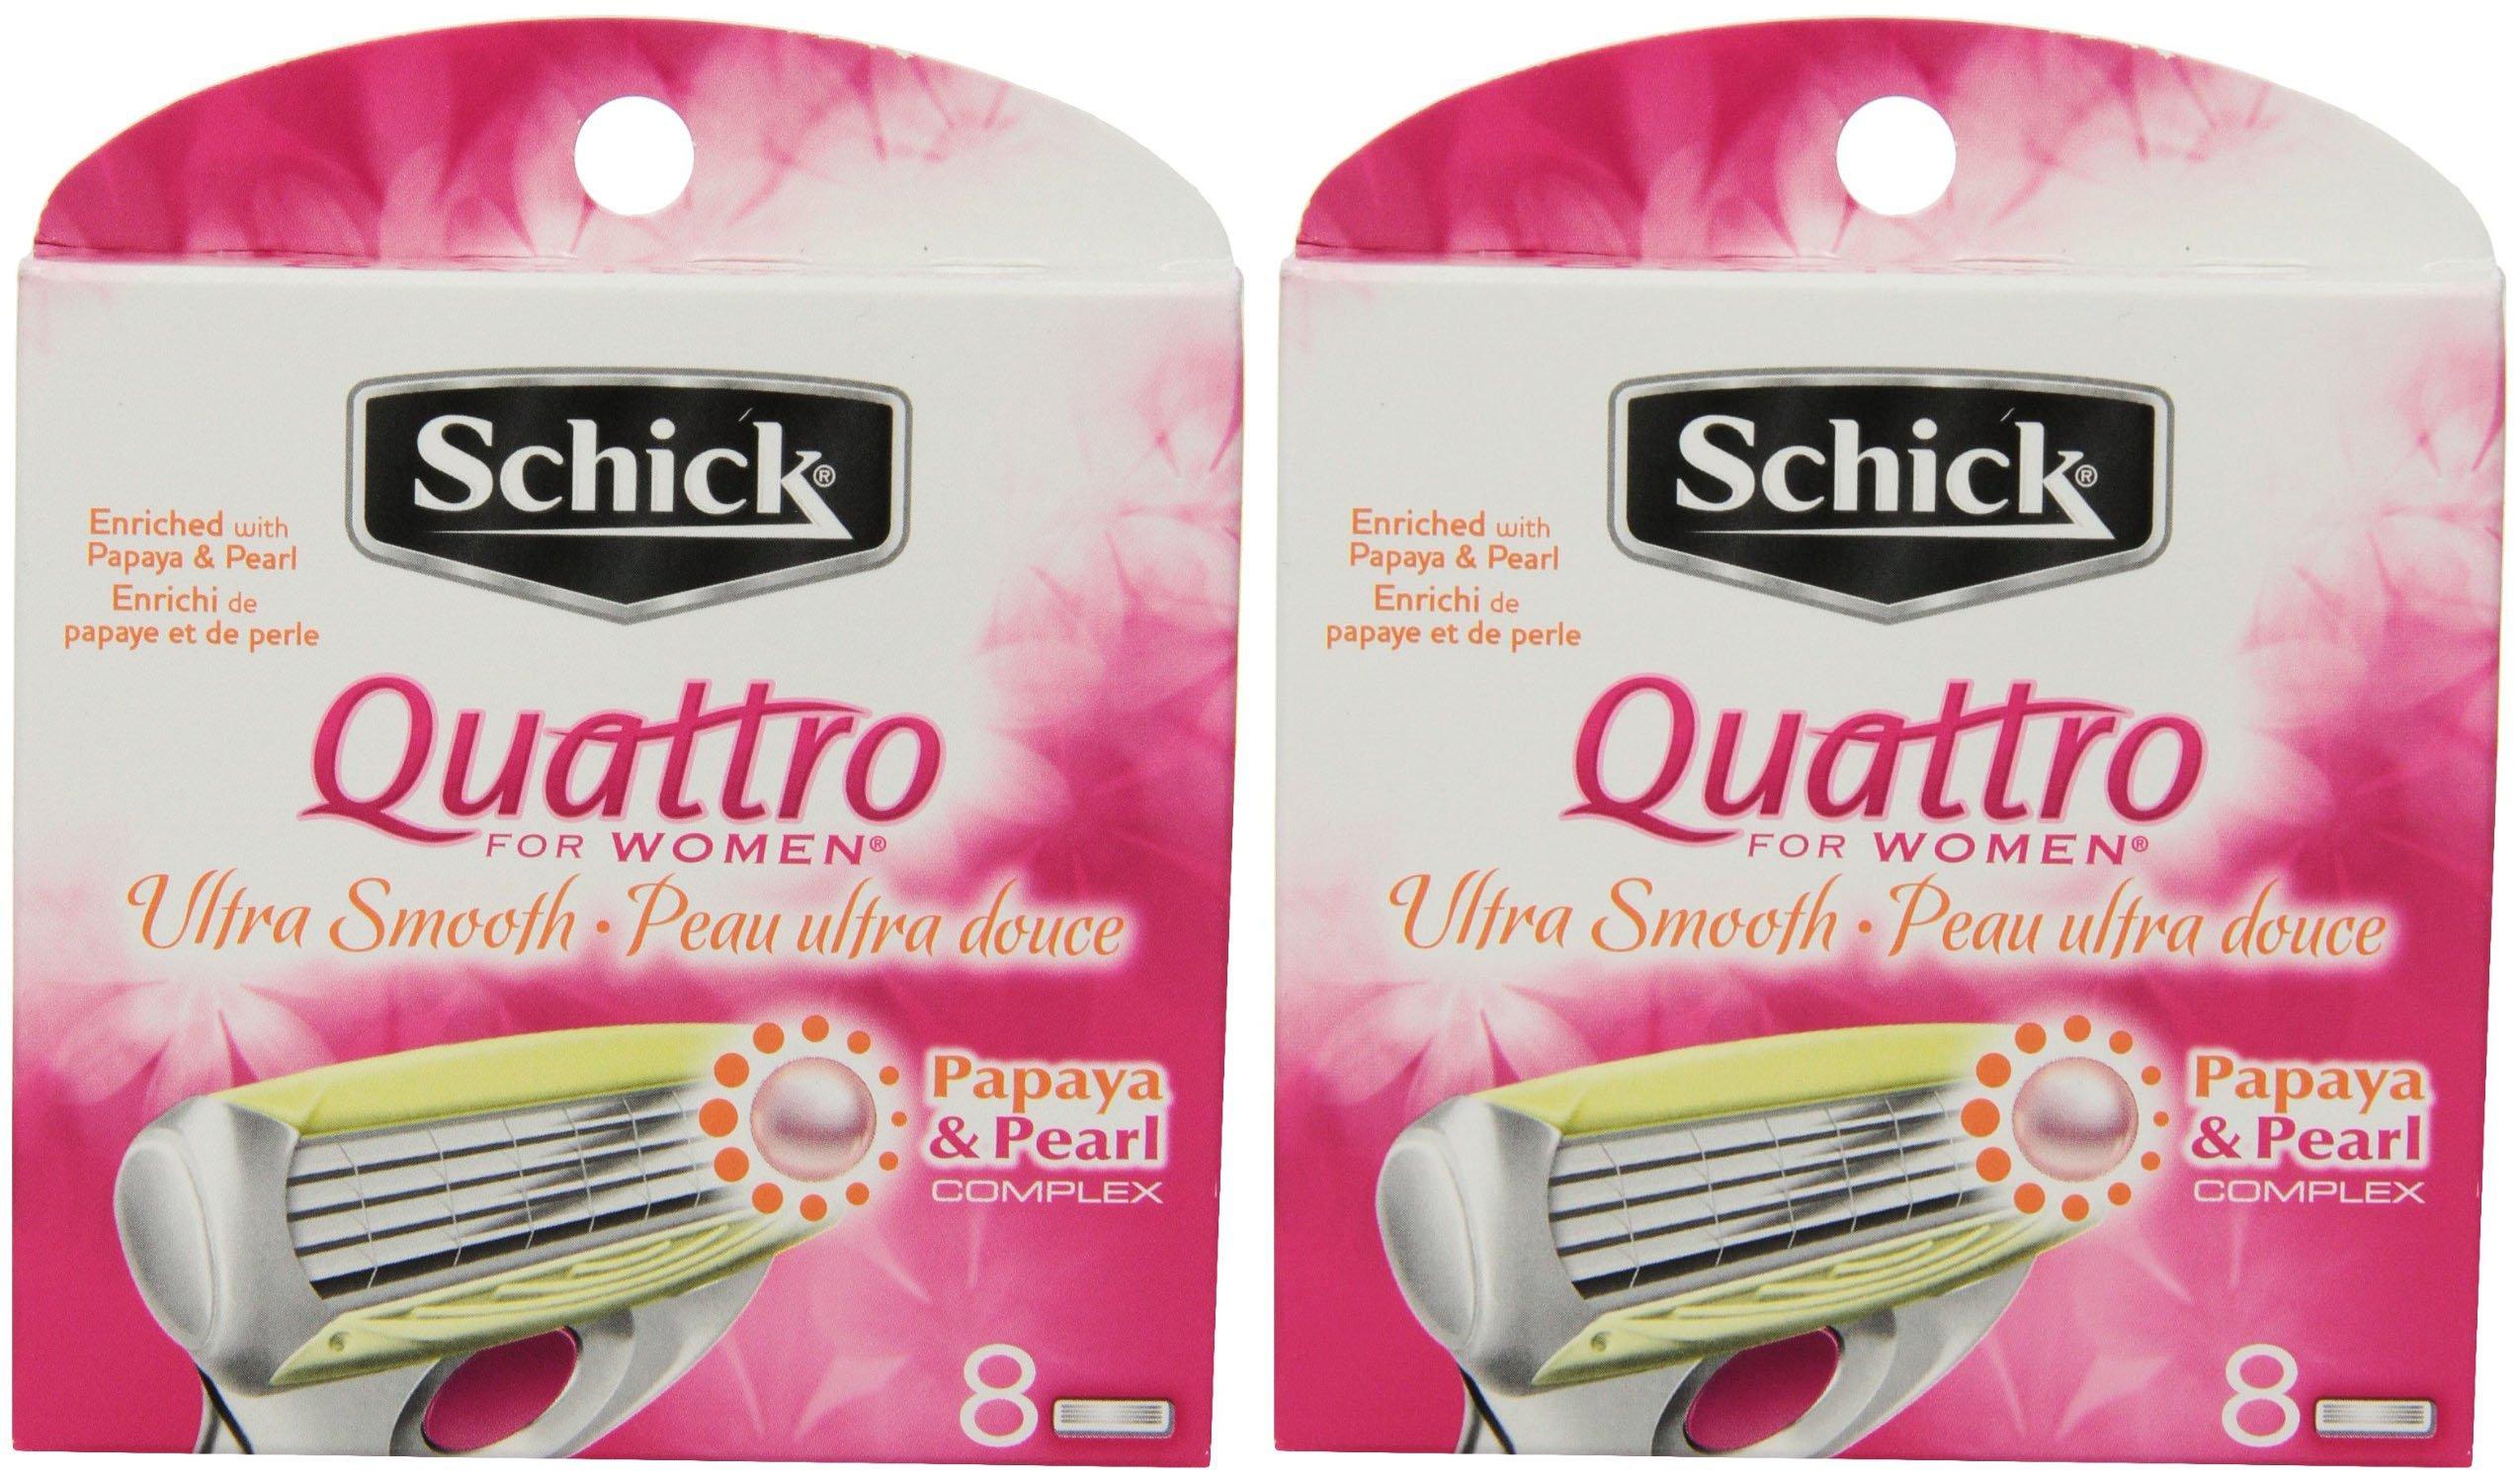 Schick Quattro for Women Razor Refill, Ultra Smooth, 8 Cartridges, 2 Pack